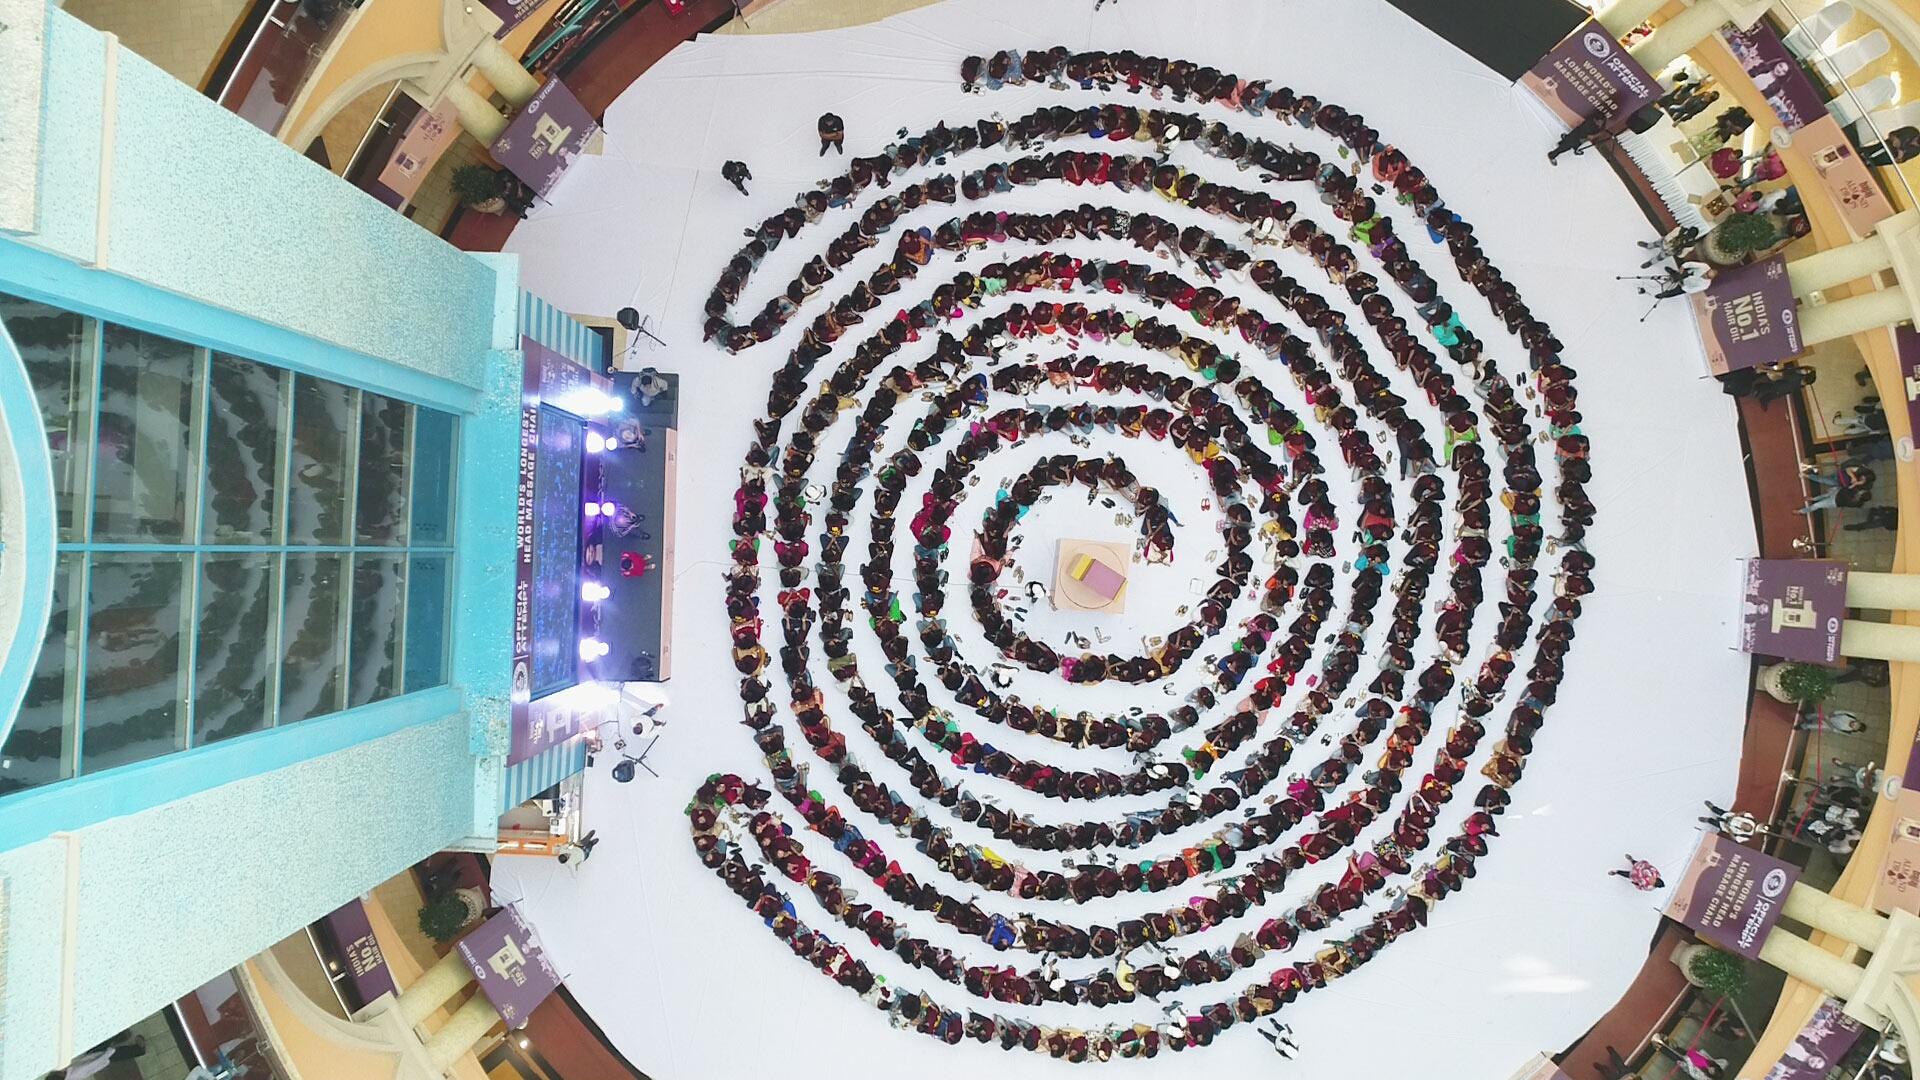 Bajaj Almond Drops Hair Oil enters the Guinness World Records - photo #33